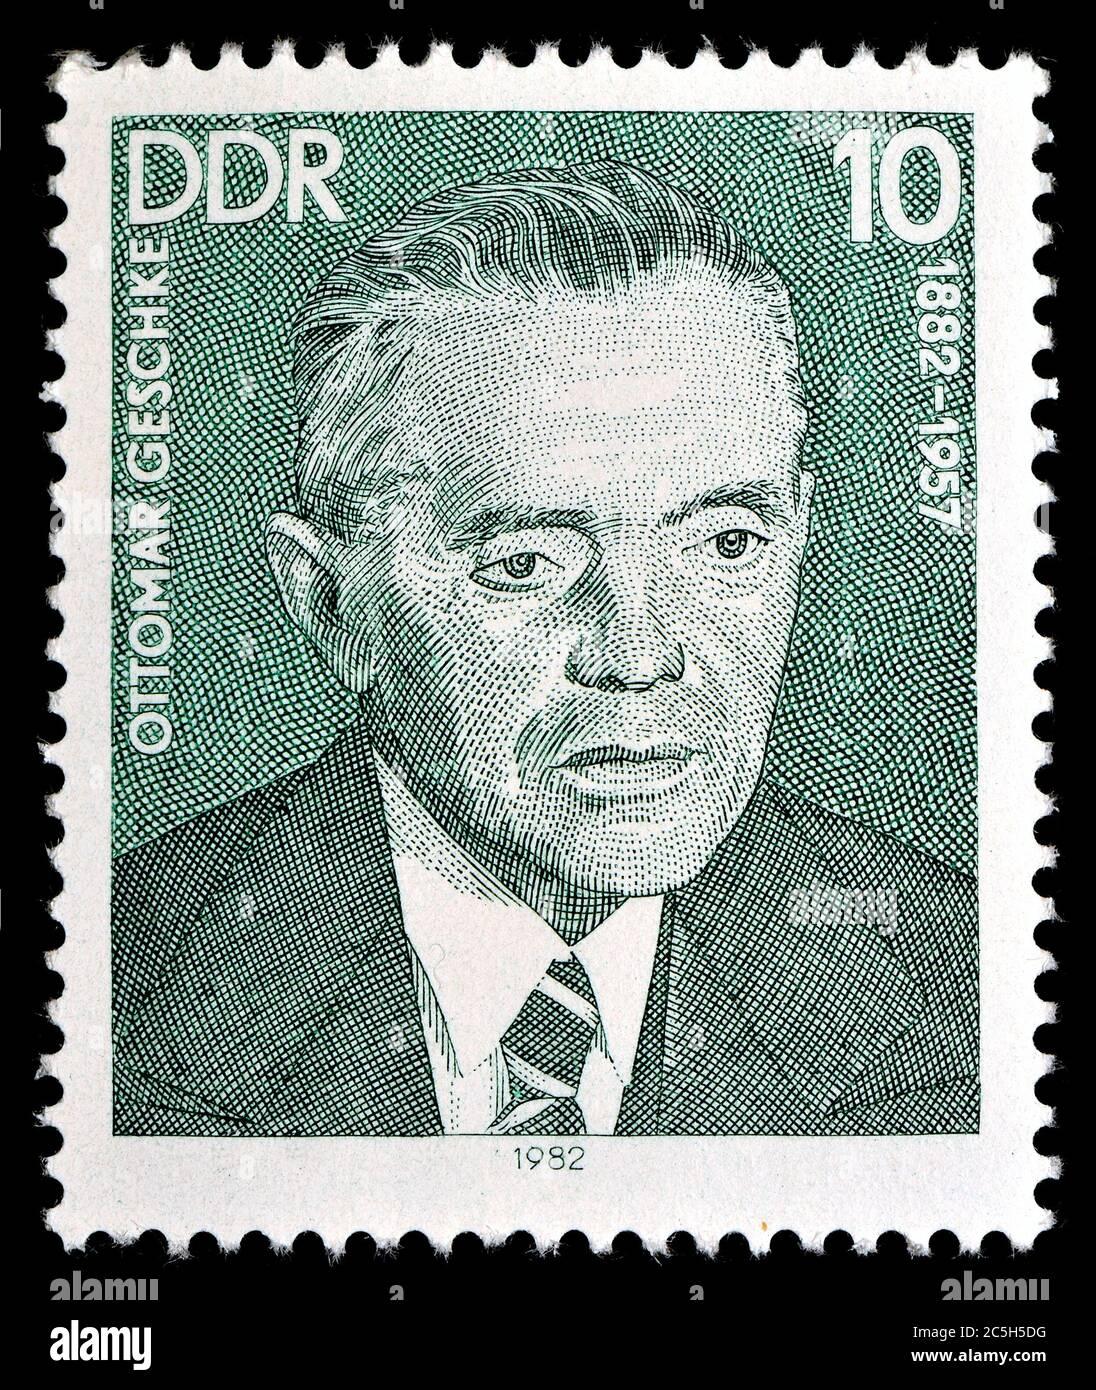 East German postage stamp (1982) : Ottomar Georg Alexander Geschke (1882- 1957) German politician (KPD, SED). Stock Photo